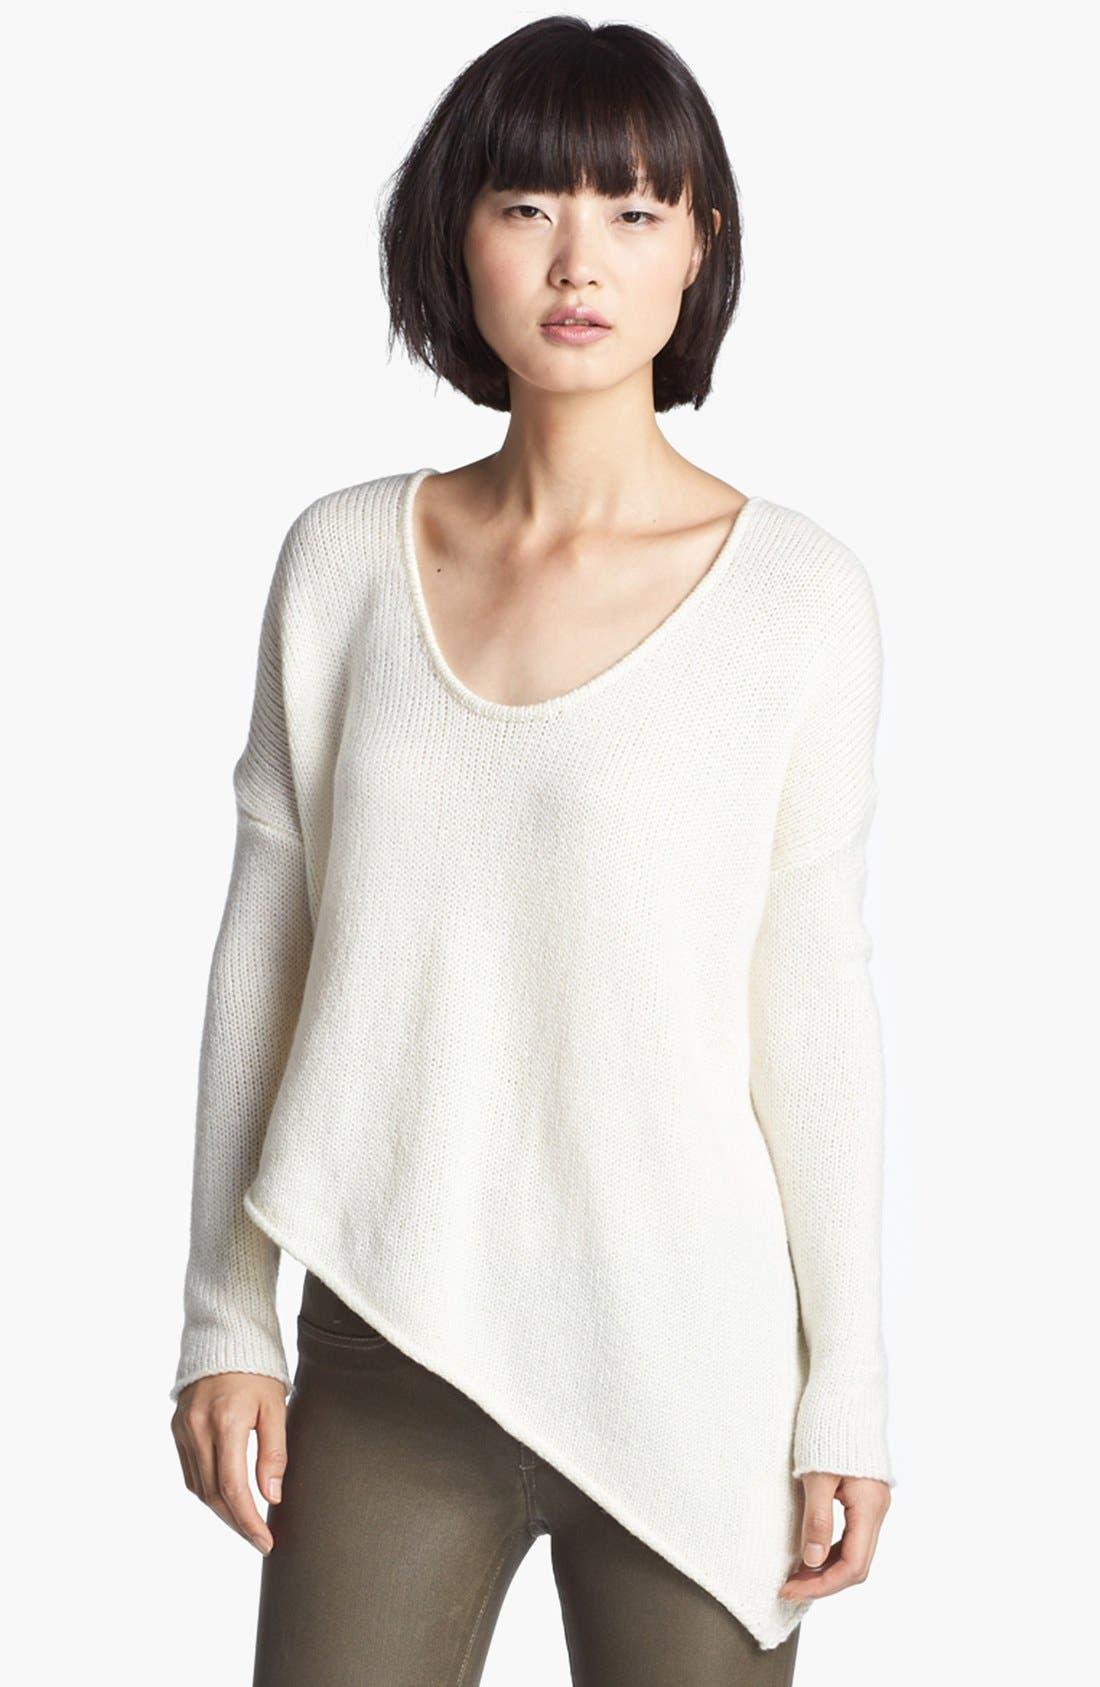 HELMUT LANG HELMUT Helmut Lang Asymmetrical Hem Sweater, Main, color, 101